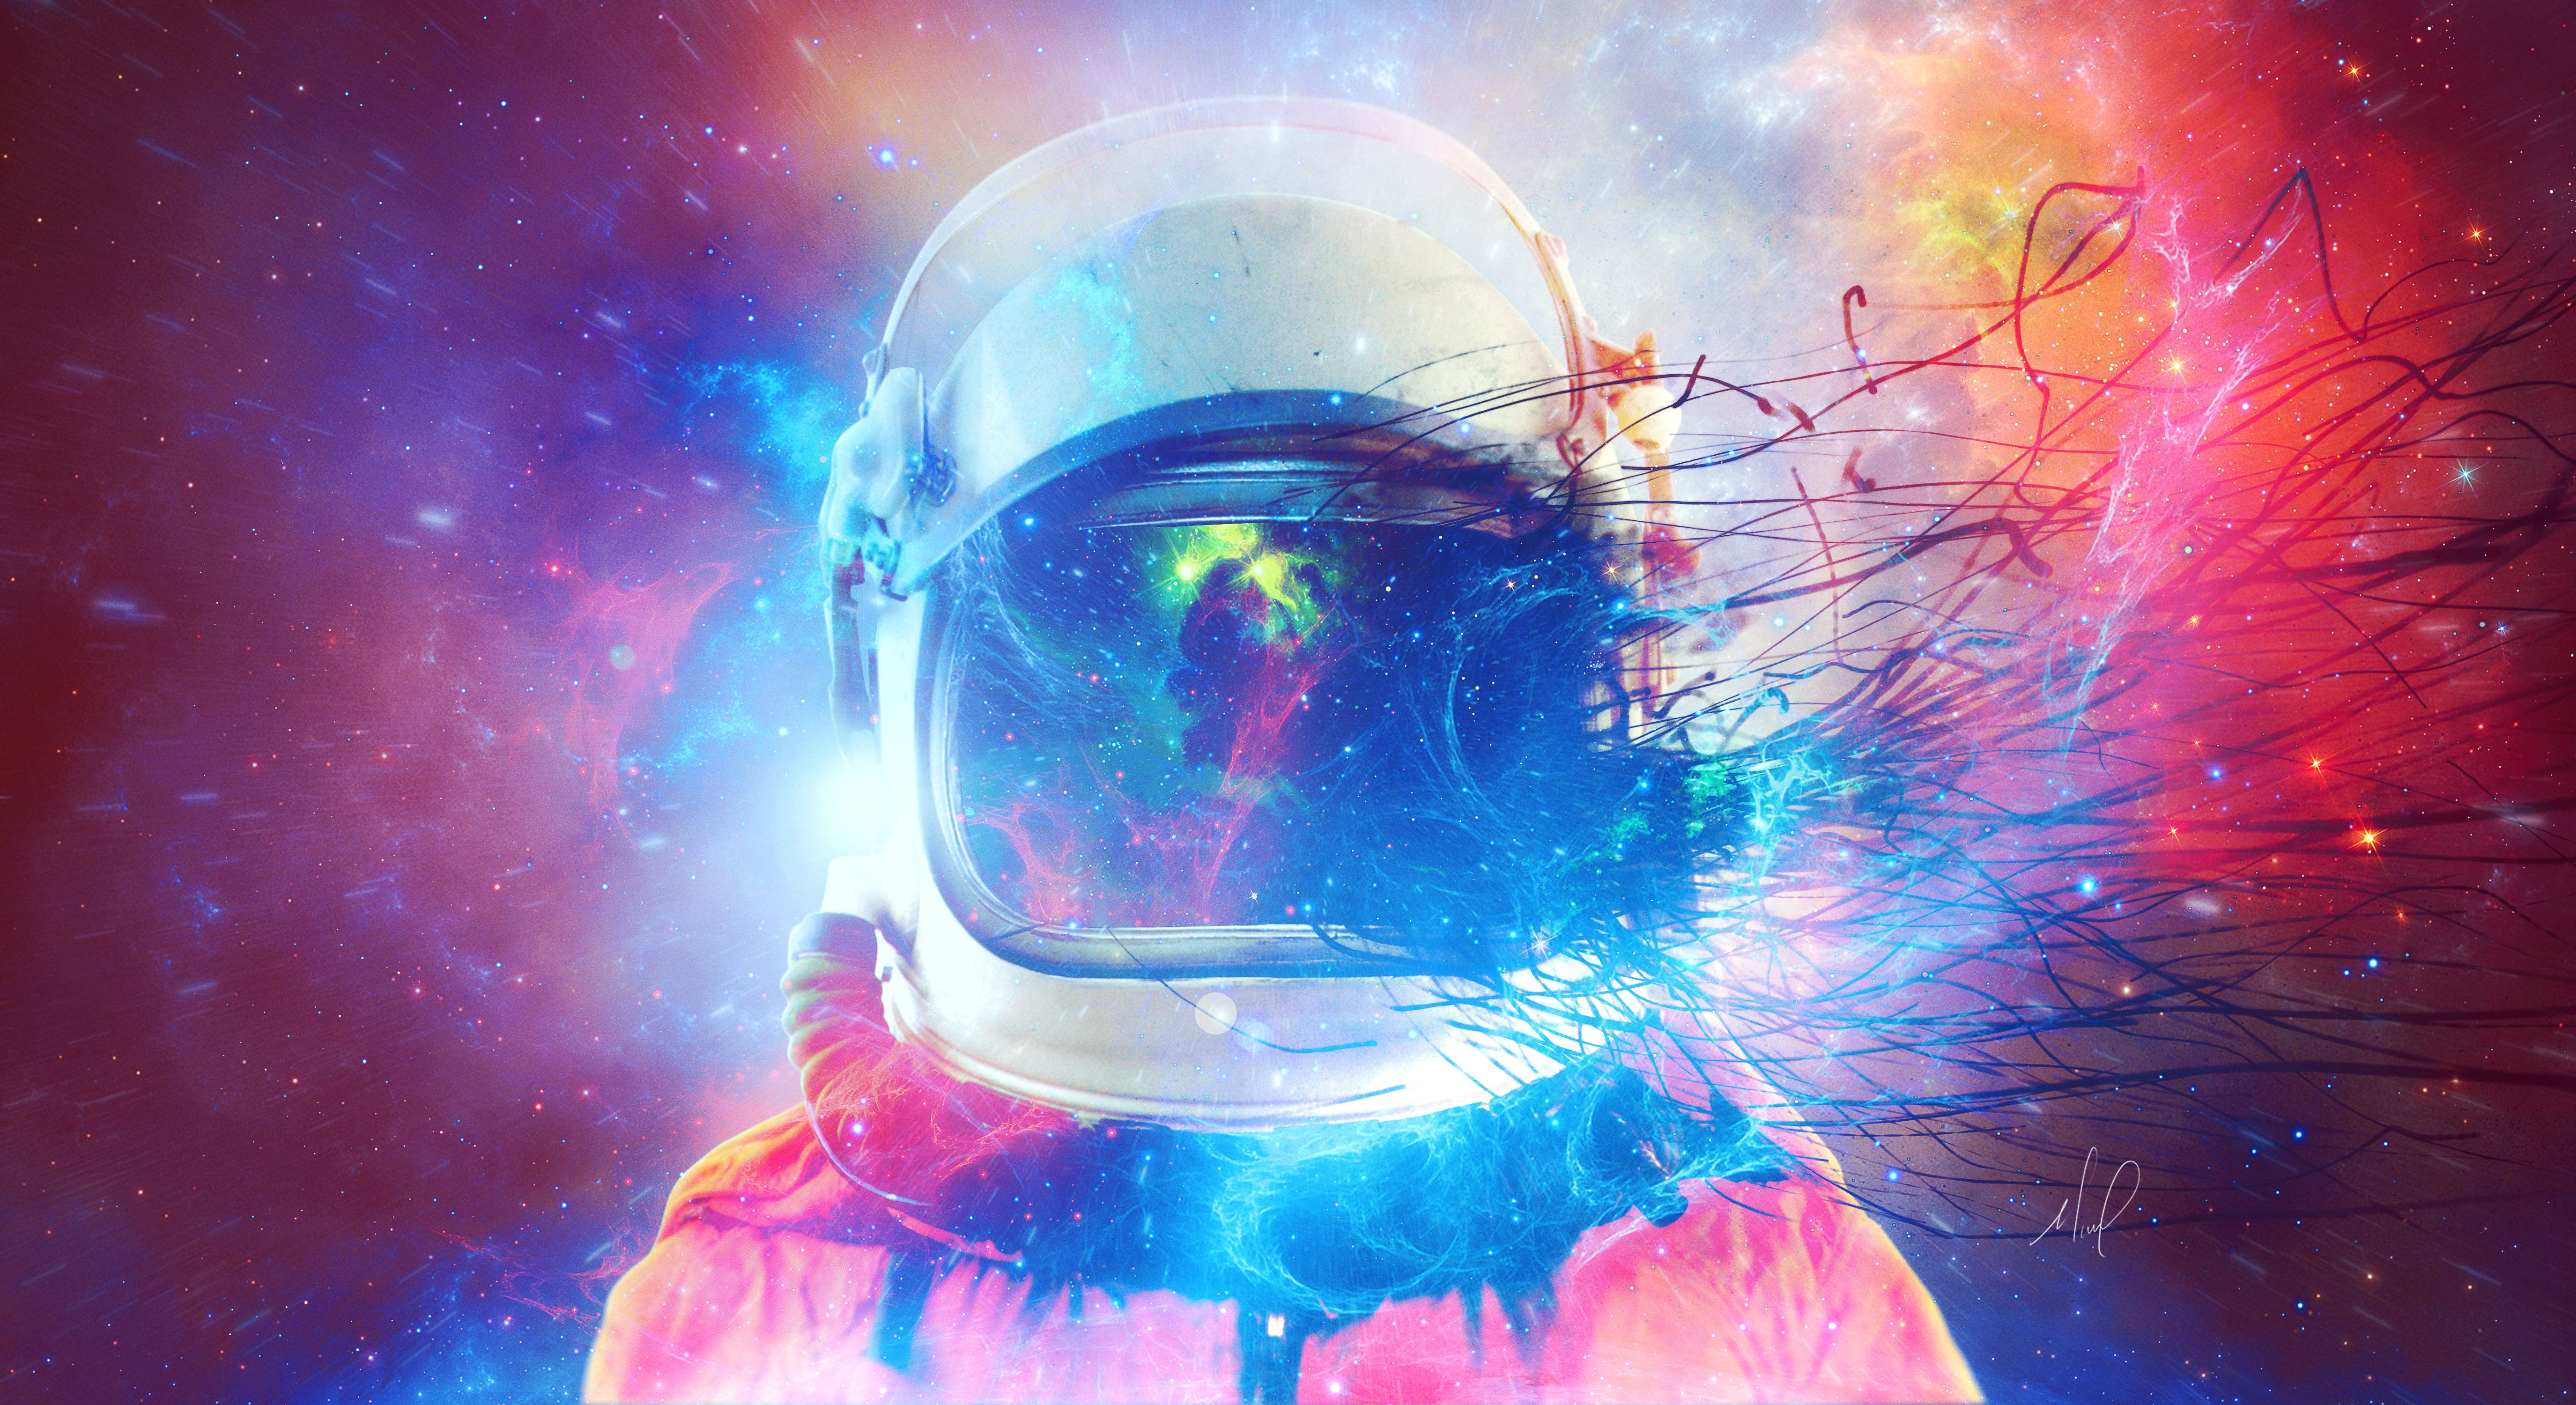 Astronaut Galaxy Wallpapers   Top Astronaut Galaxy 5500x3000